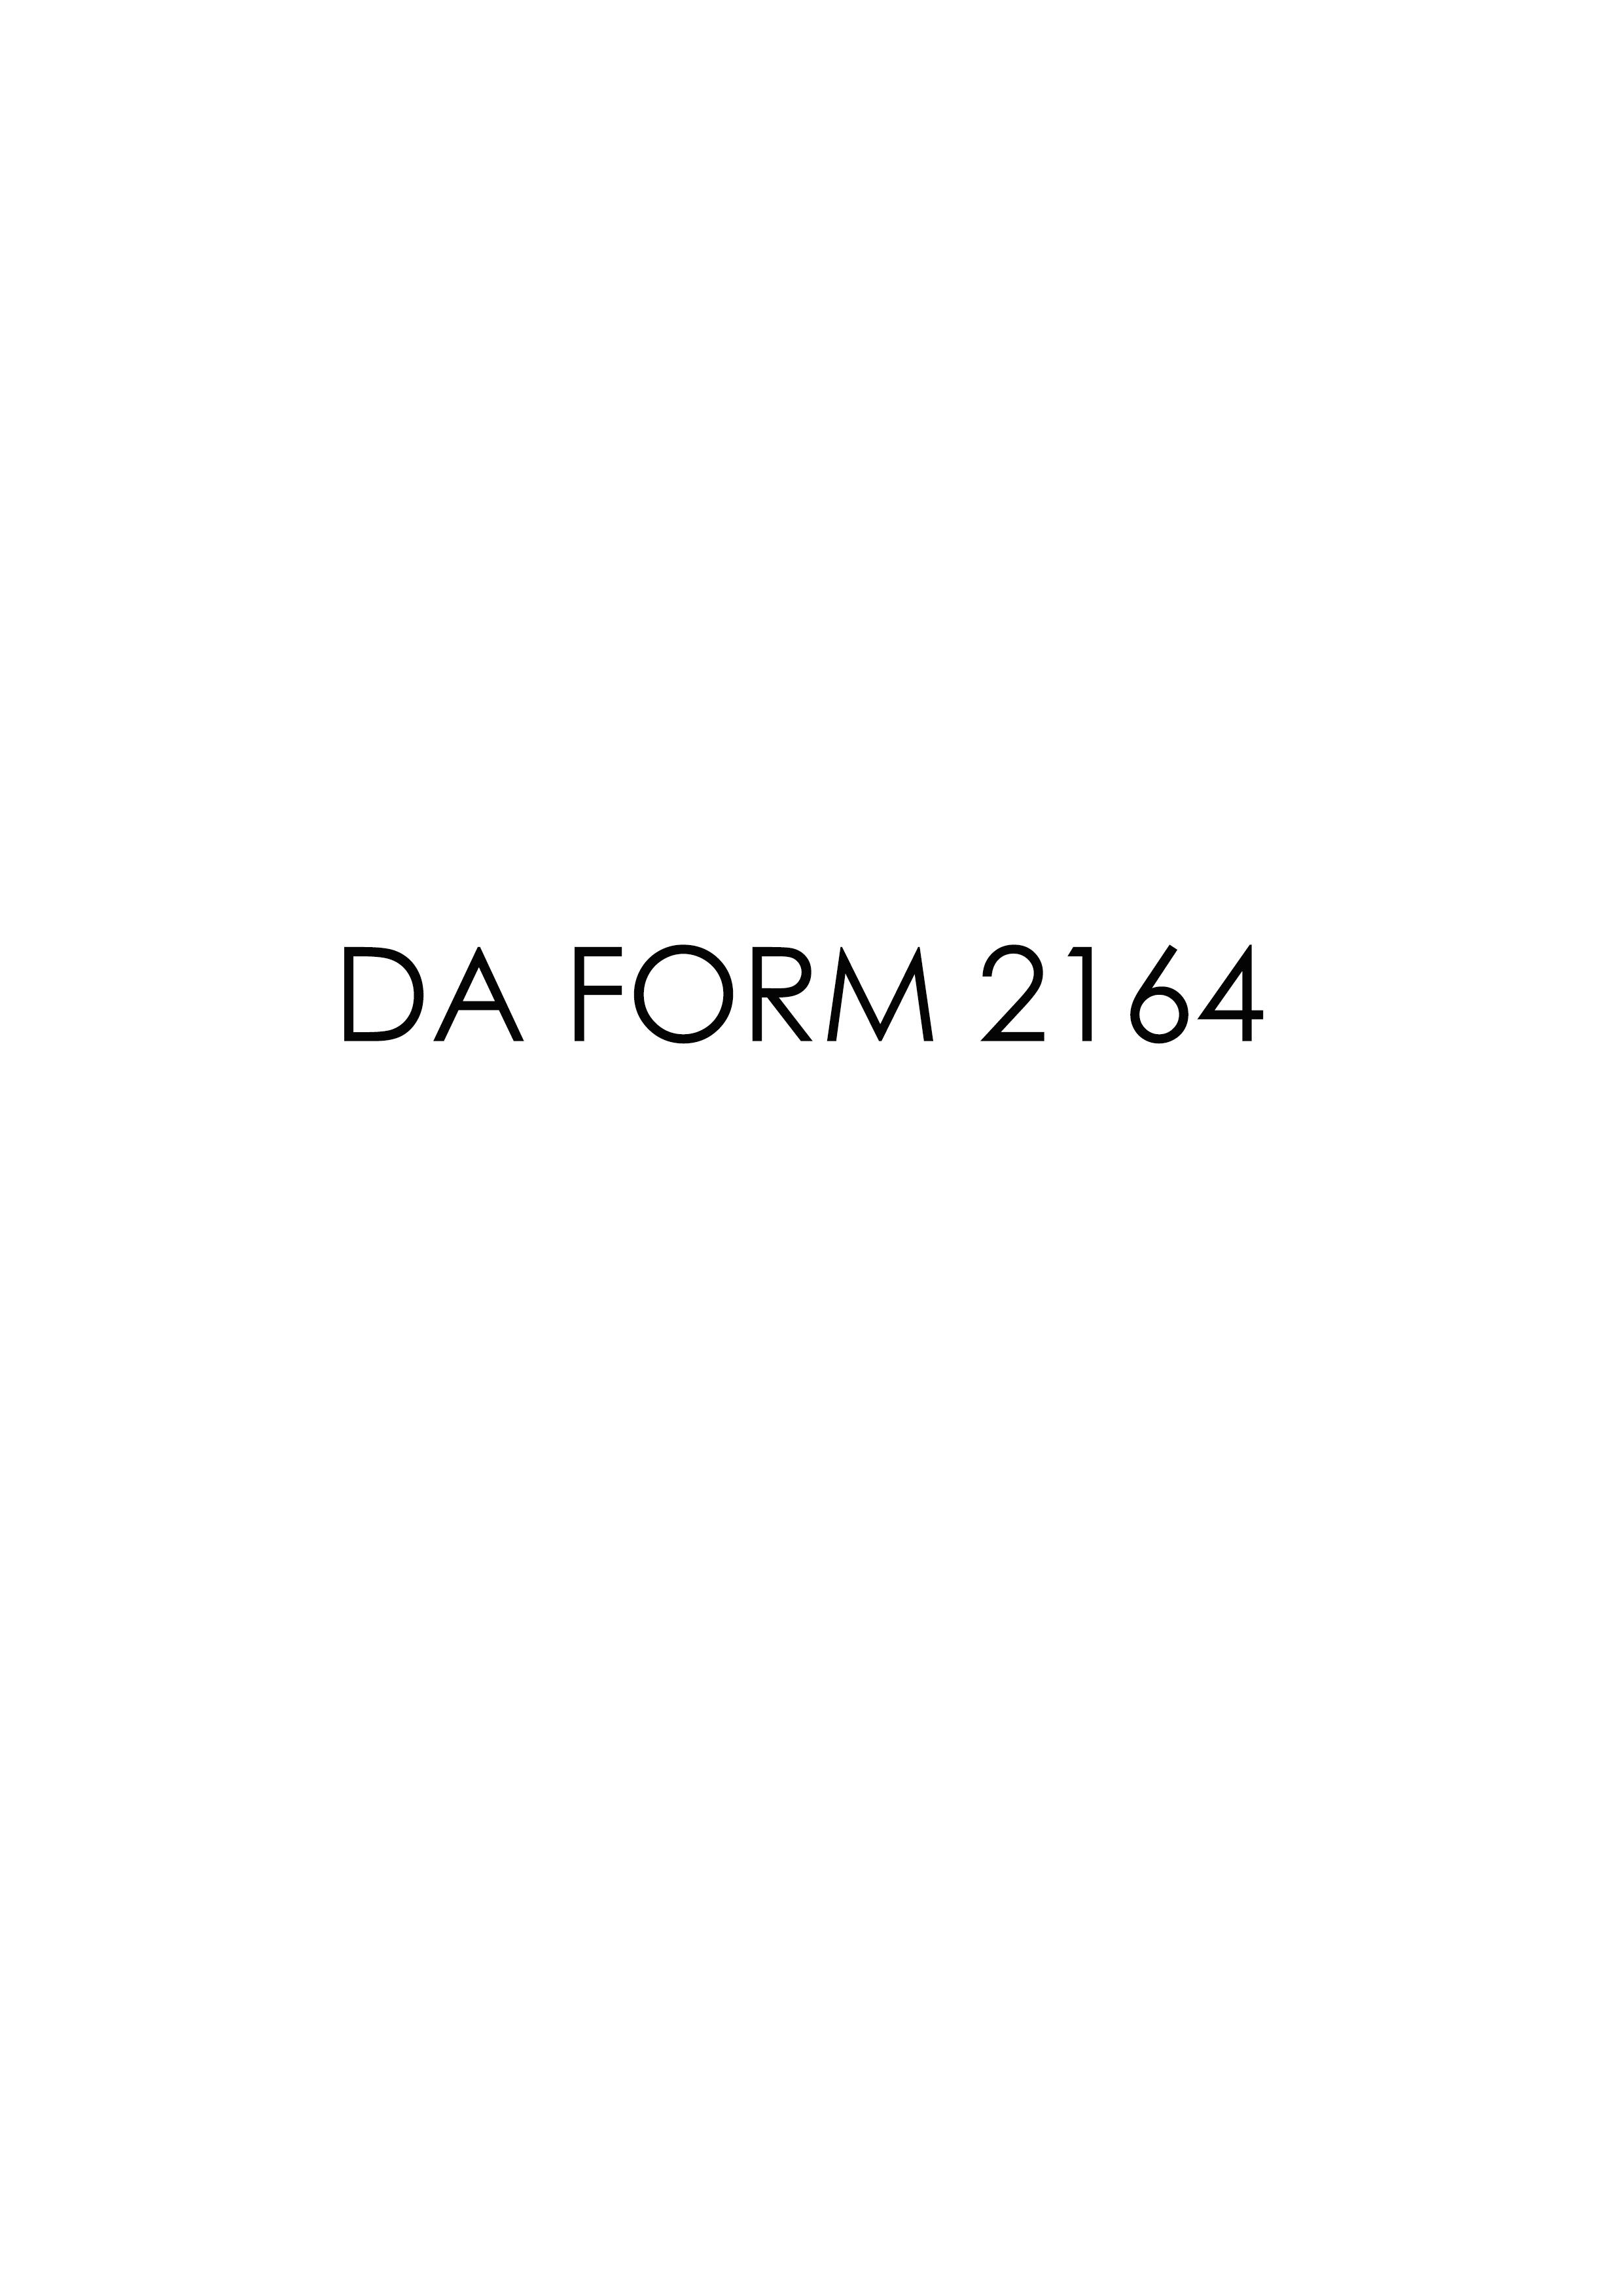 Download da Form 2164 Free